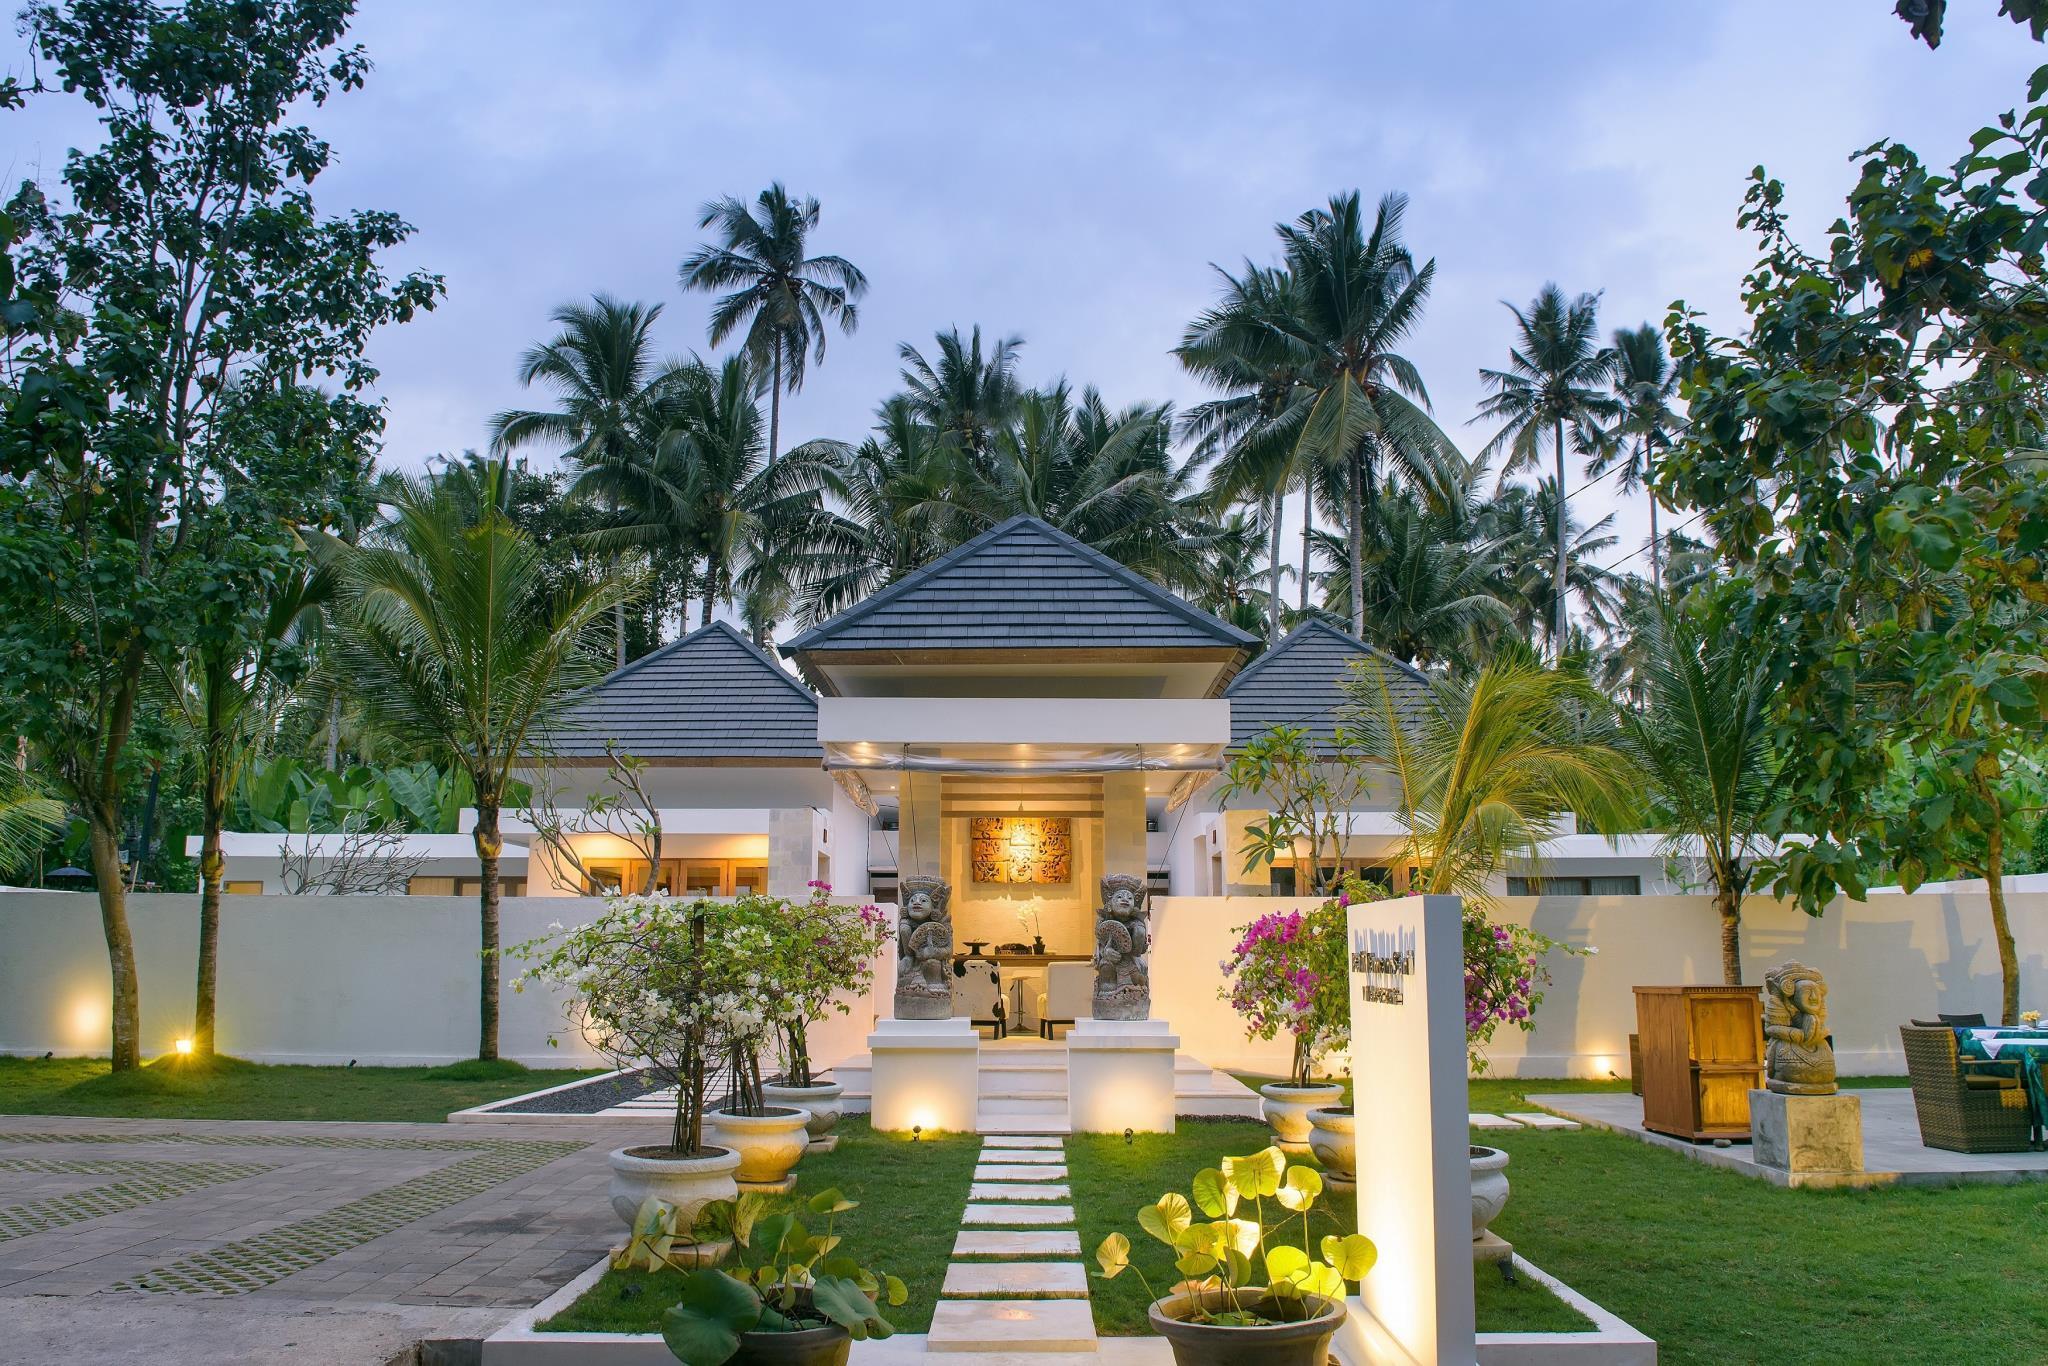 Bali Taman Sari Villas & Restaurant, Jembrana